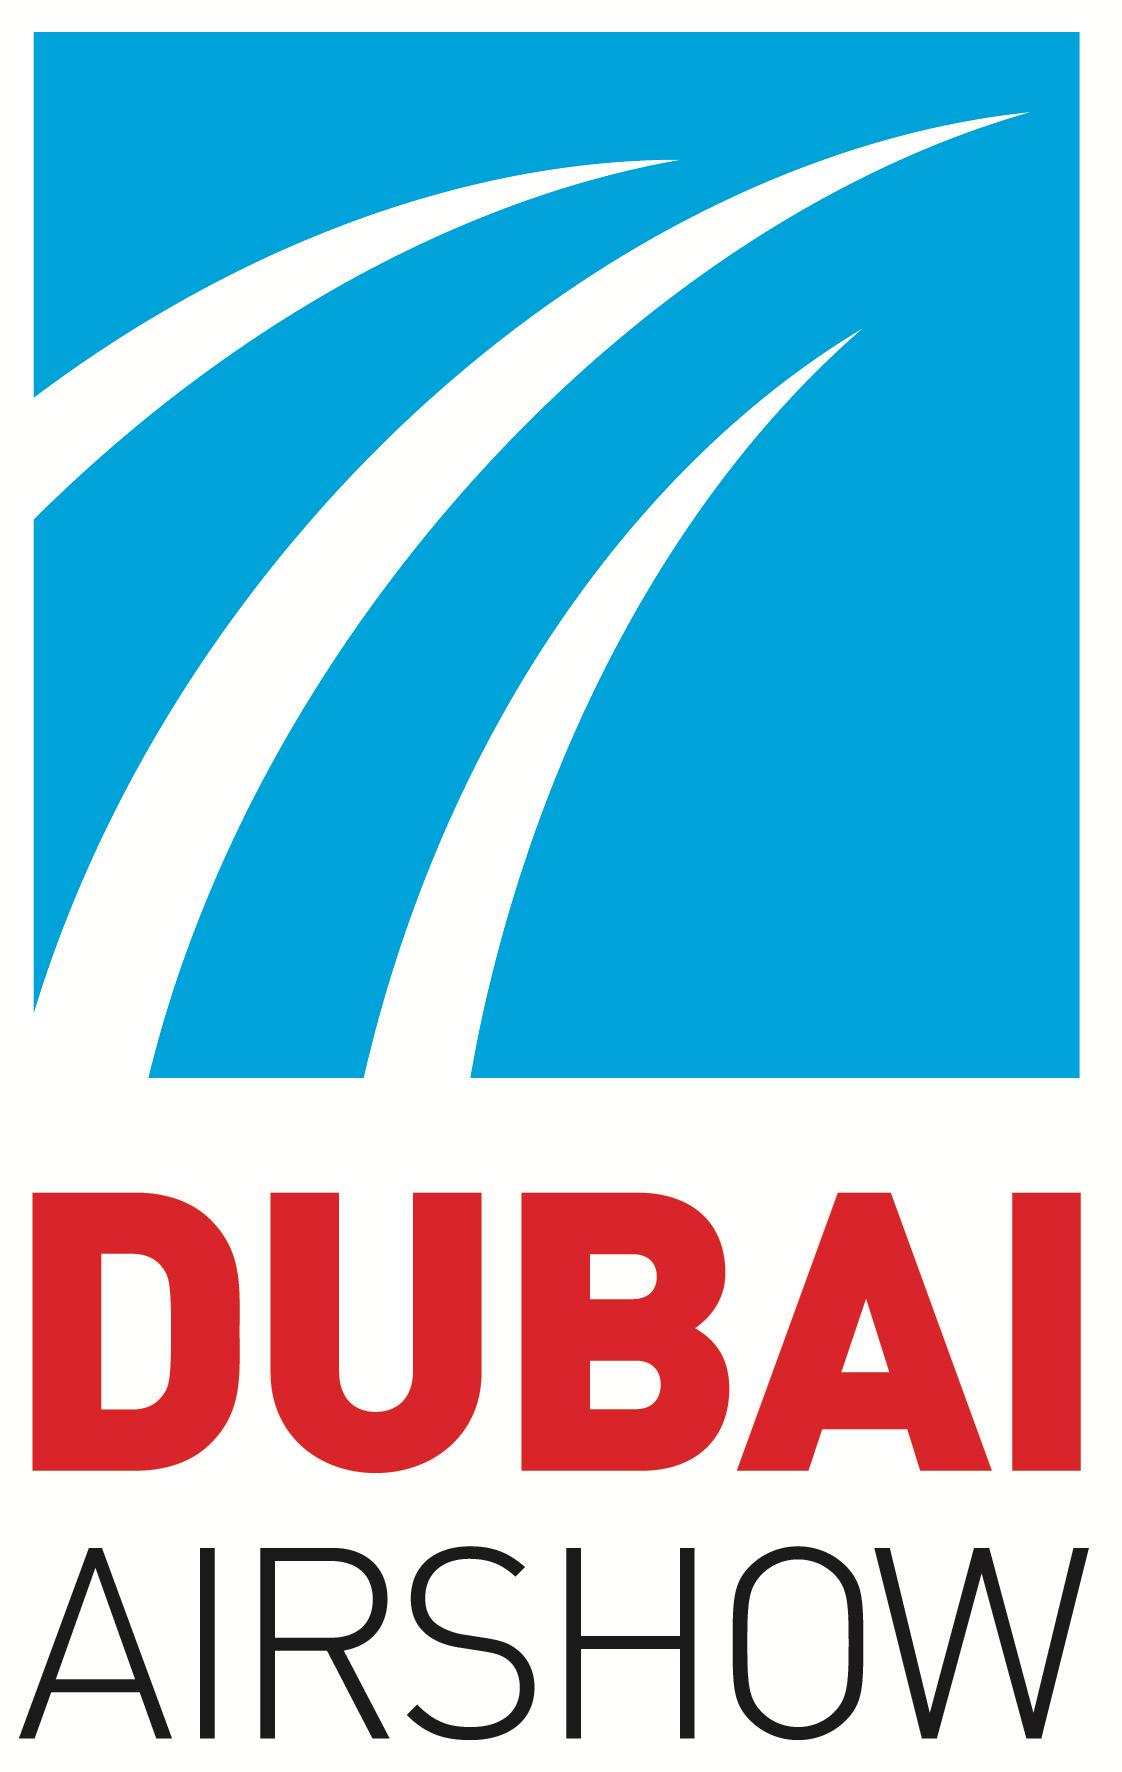 Dubai-Airshow_Isologotype